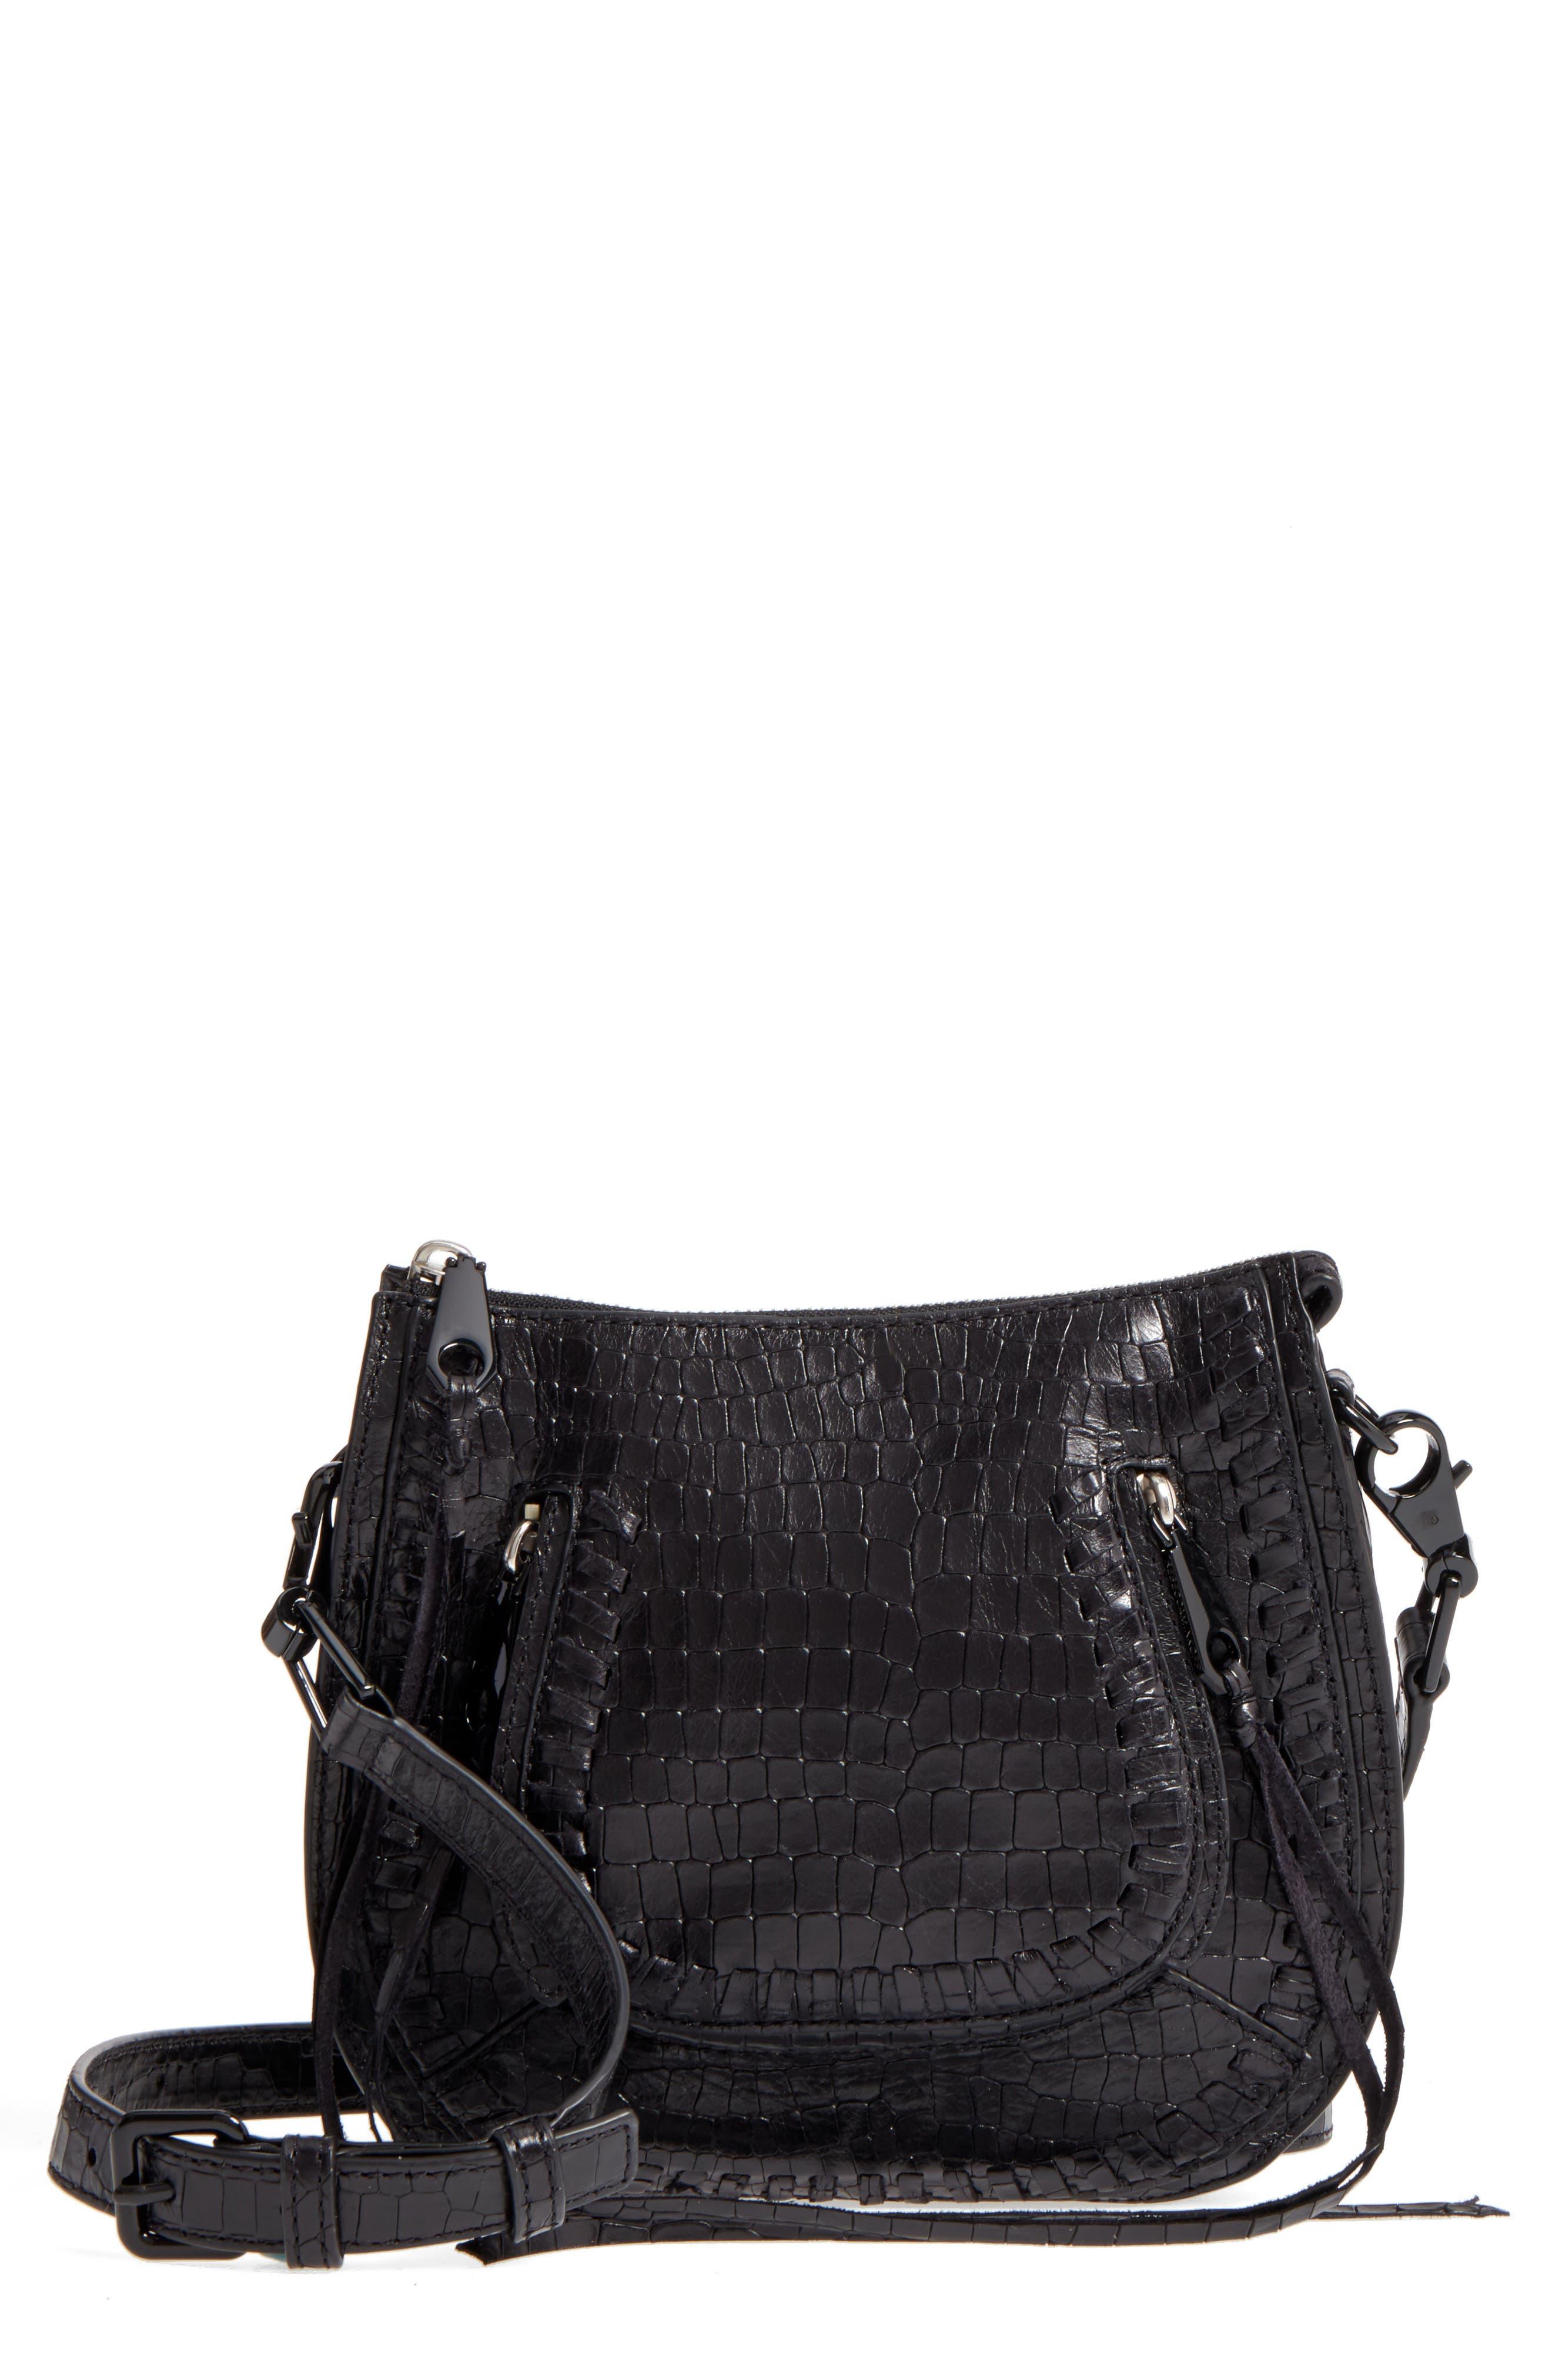 Vanity Croc-Embossed Leather Saddle Bag,                             Main thumbnail 1, color,